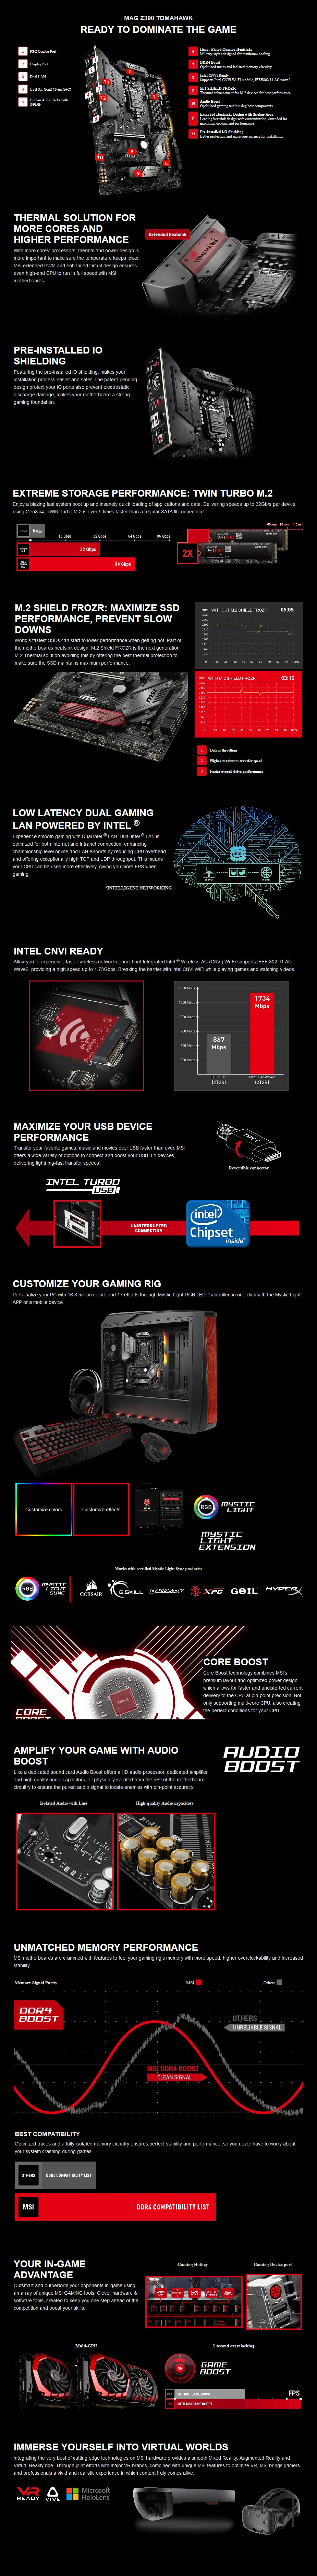 MSI MAG Z390 TOMAHAWK LGA 1151 ATX Motherboard - Desktop Overview 1